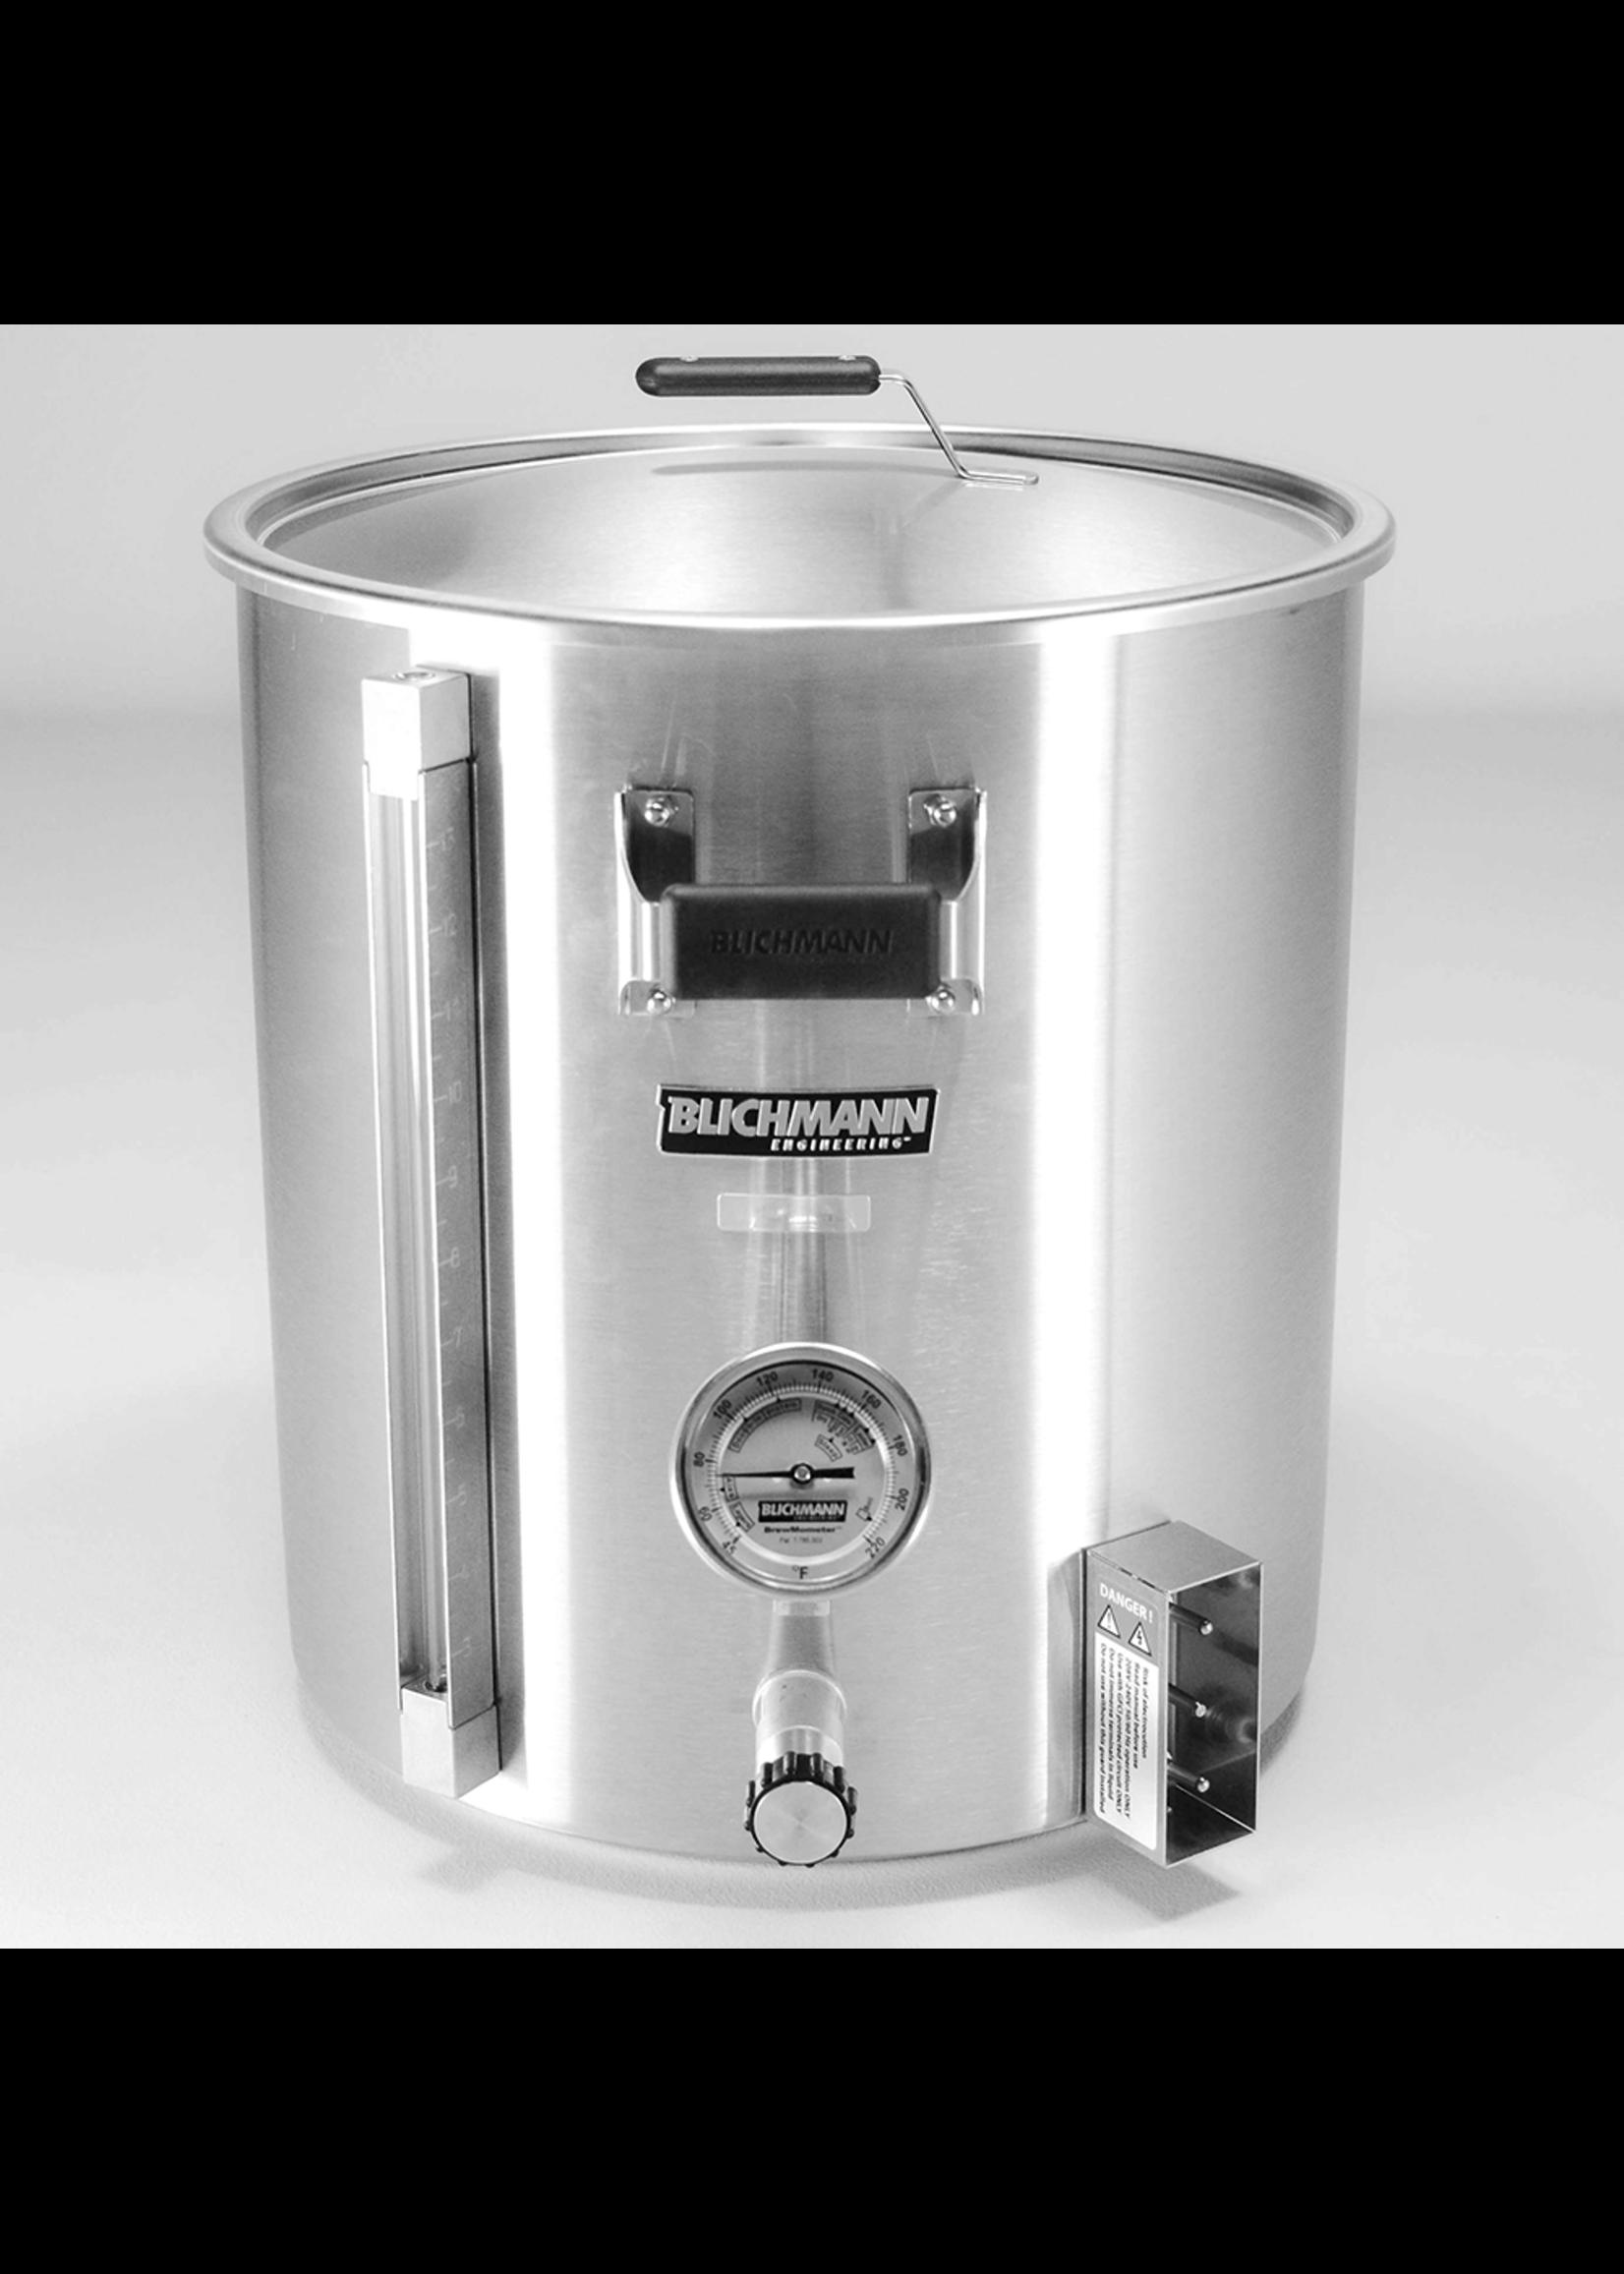 Blichmann Blichmann BoilerMaker G2 - 7.5 Gallon 120V Electric Brew Kettle (Celsius)